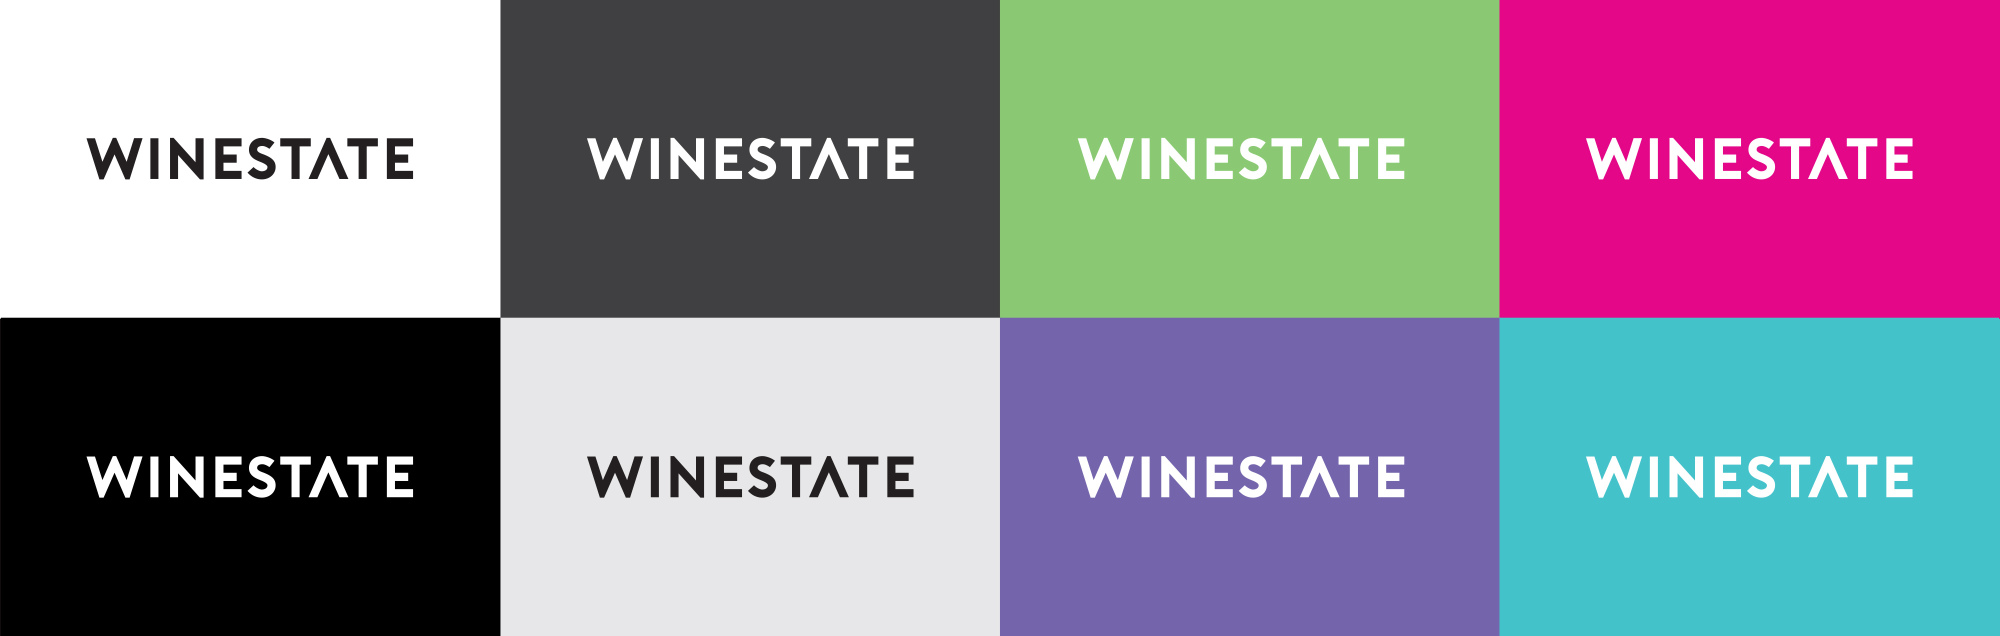 bm_winestate3